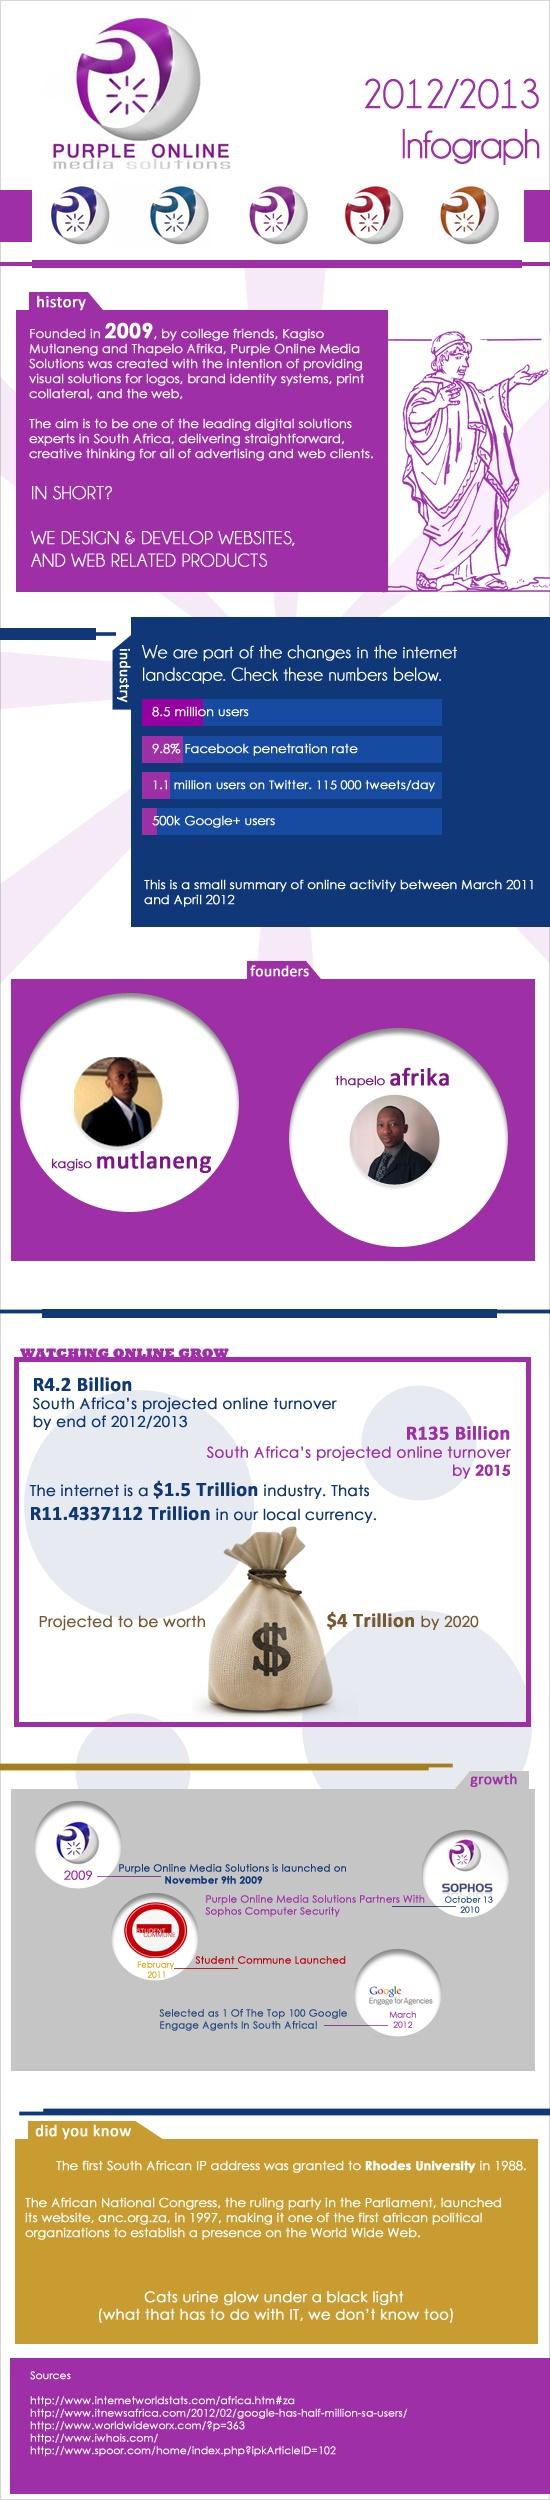 Purple Online Media Solutions 2012/2013 Infograph